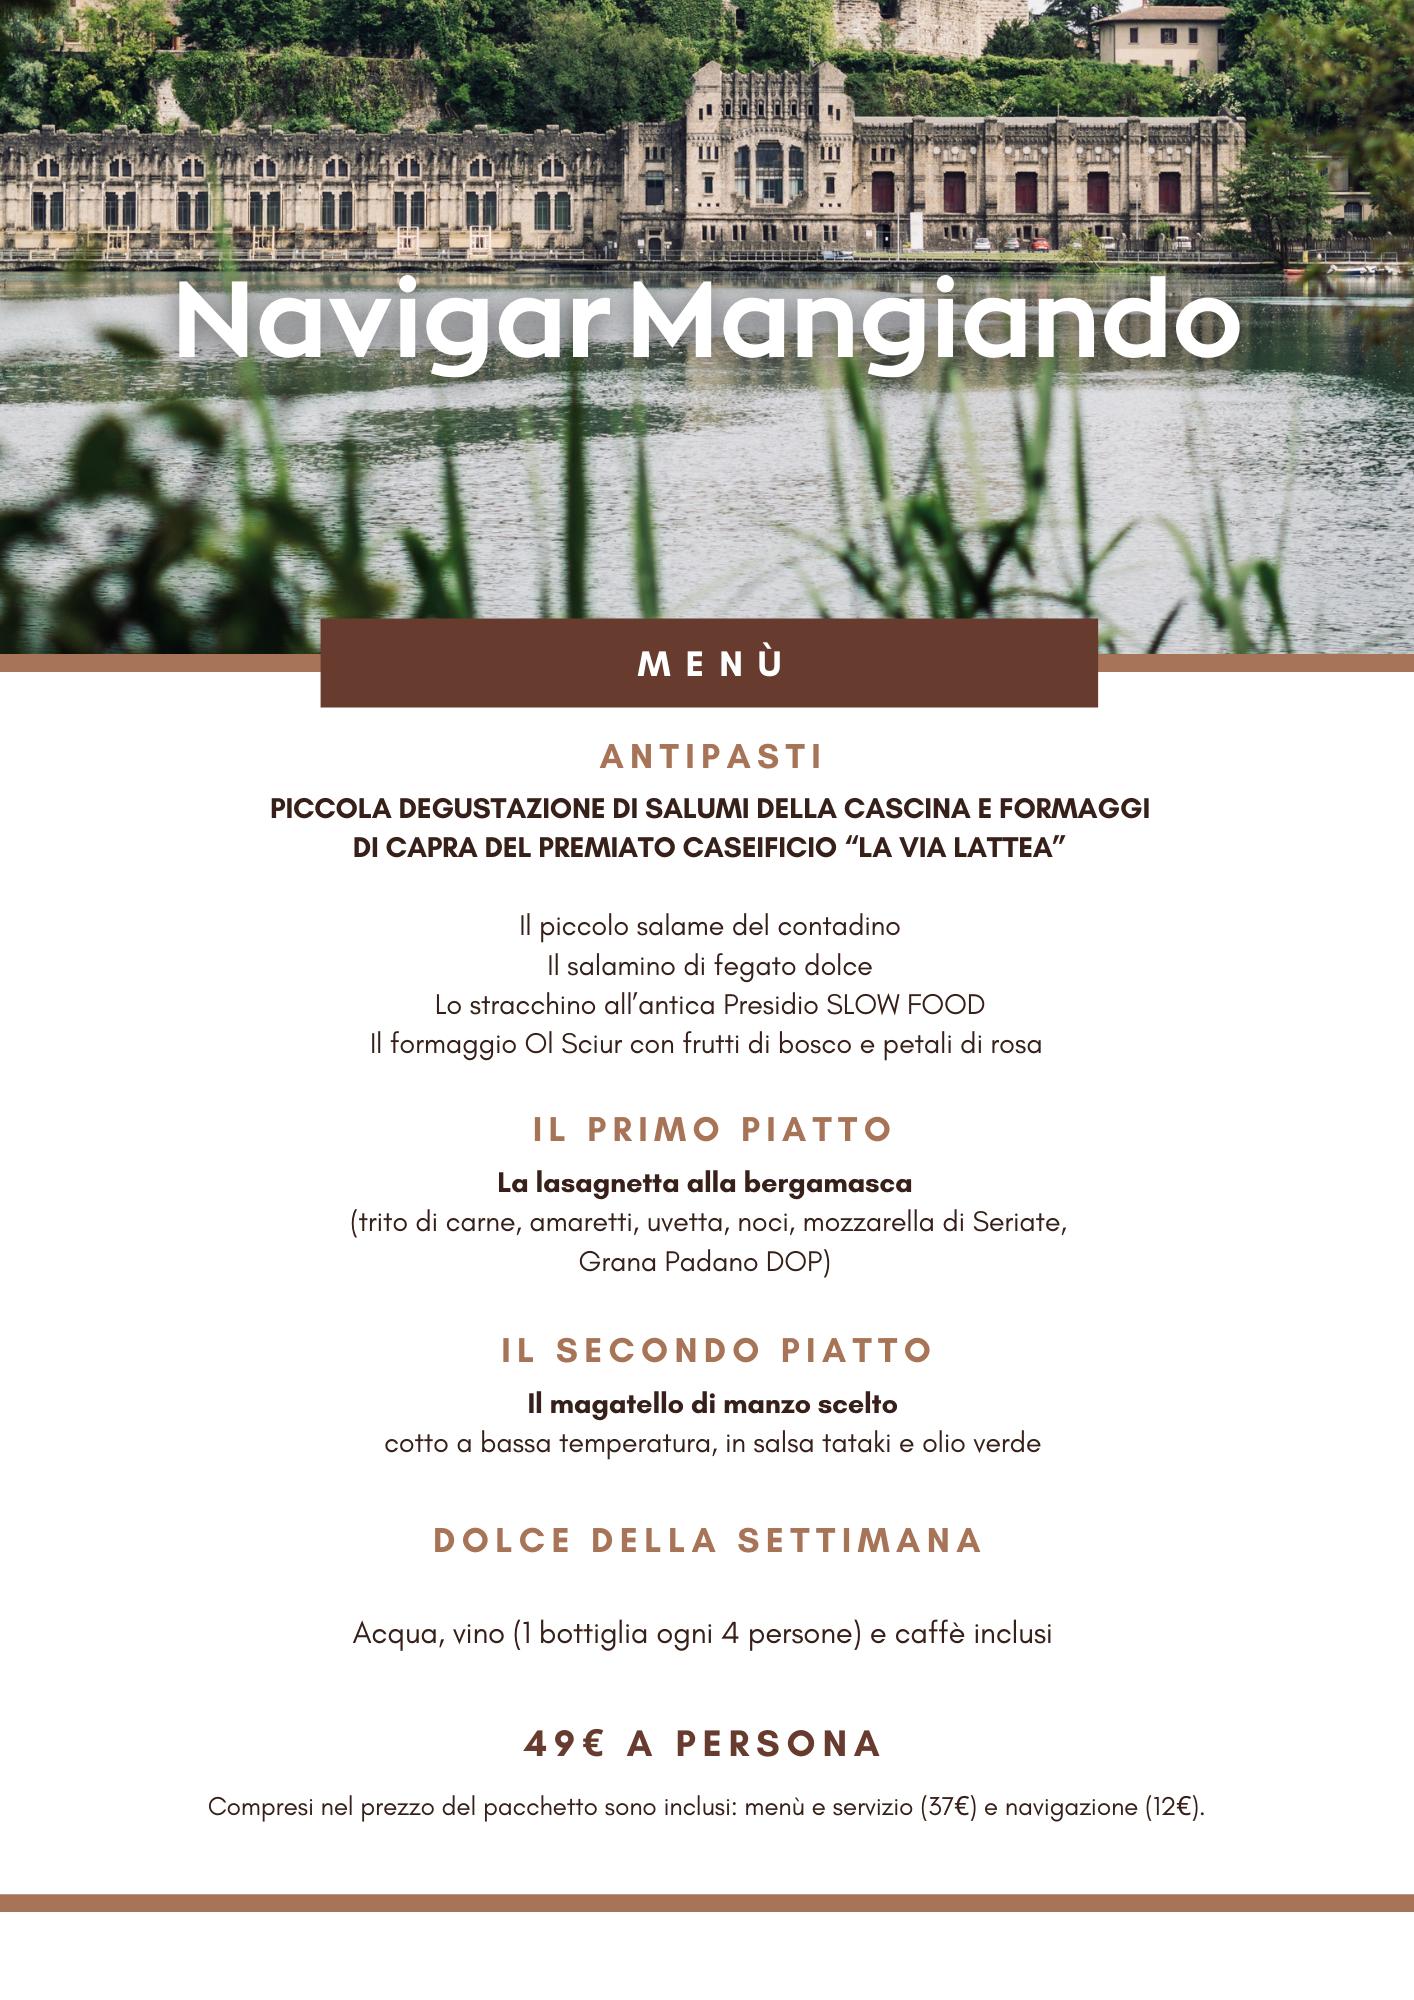 Navigar Mangiando Milano